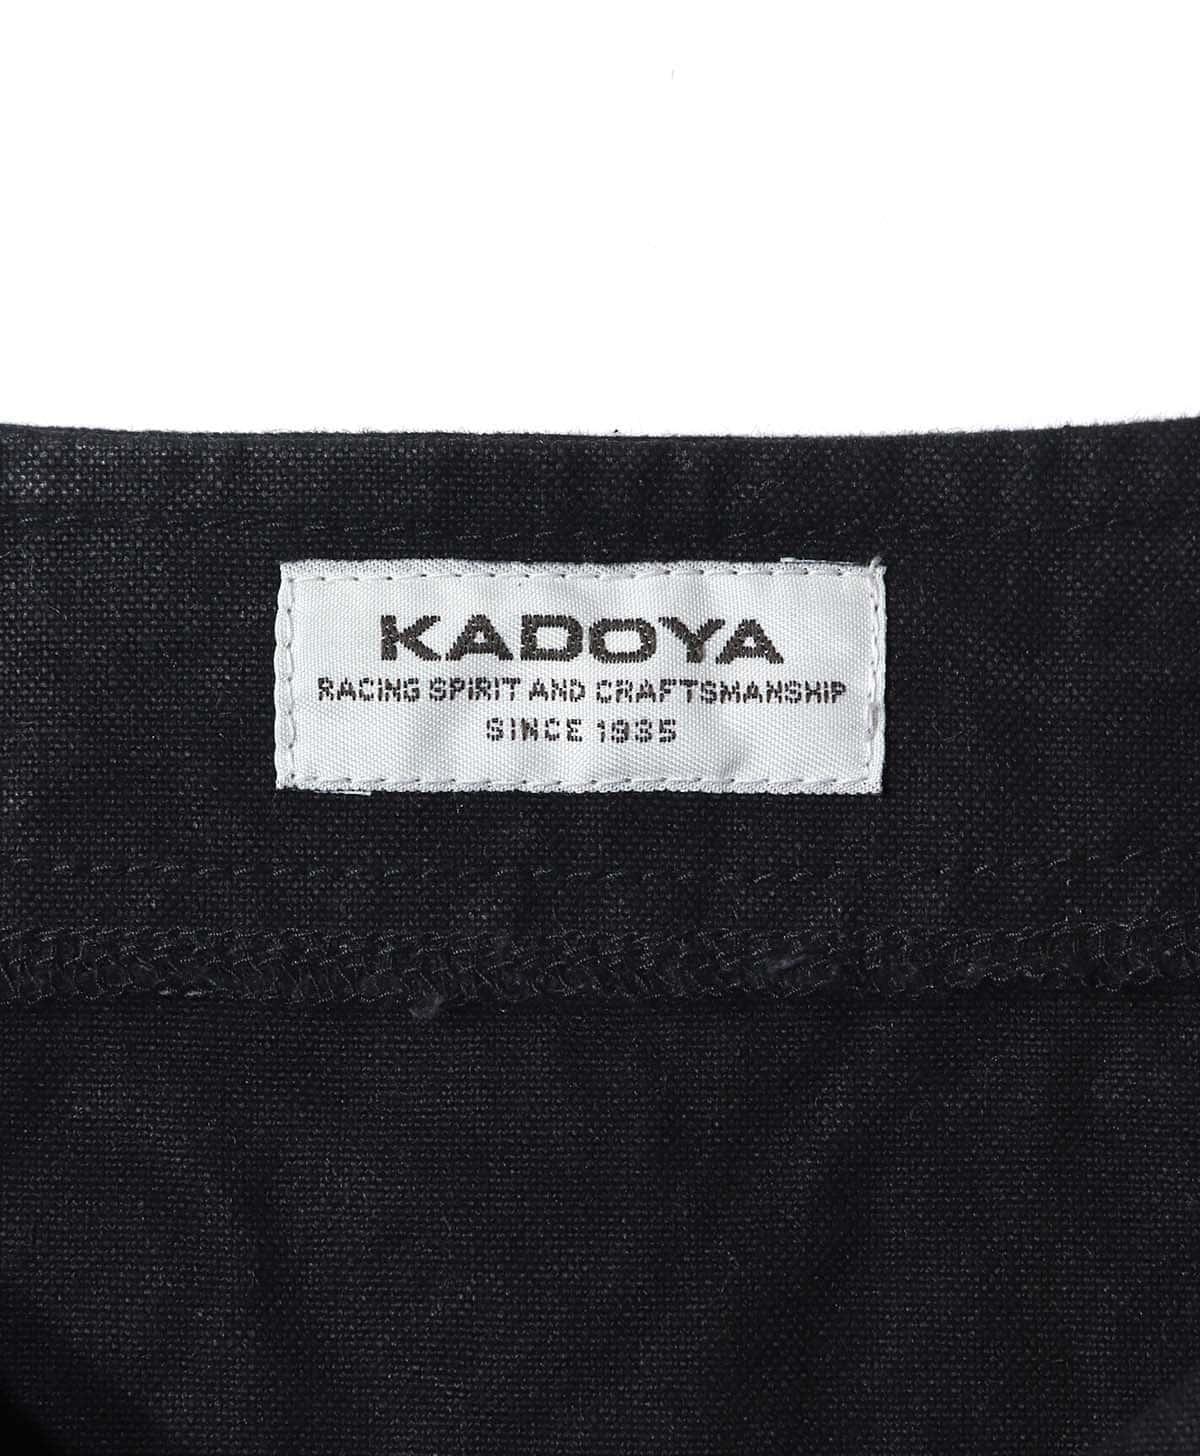 KADOYA(カドヤ) RIDERS WORK VEST ライダースワークベスト ダッグ生地ベスト ブラック